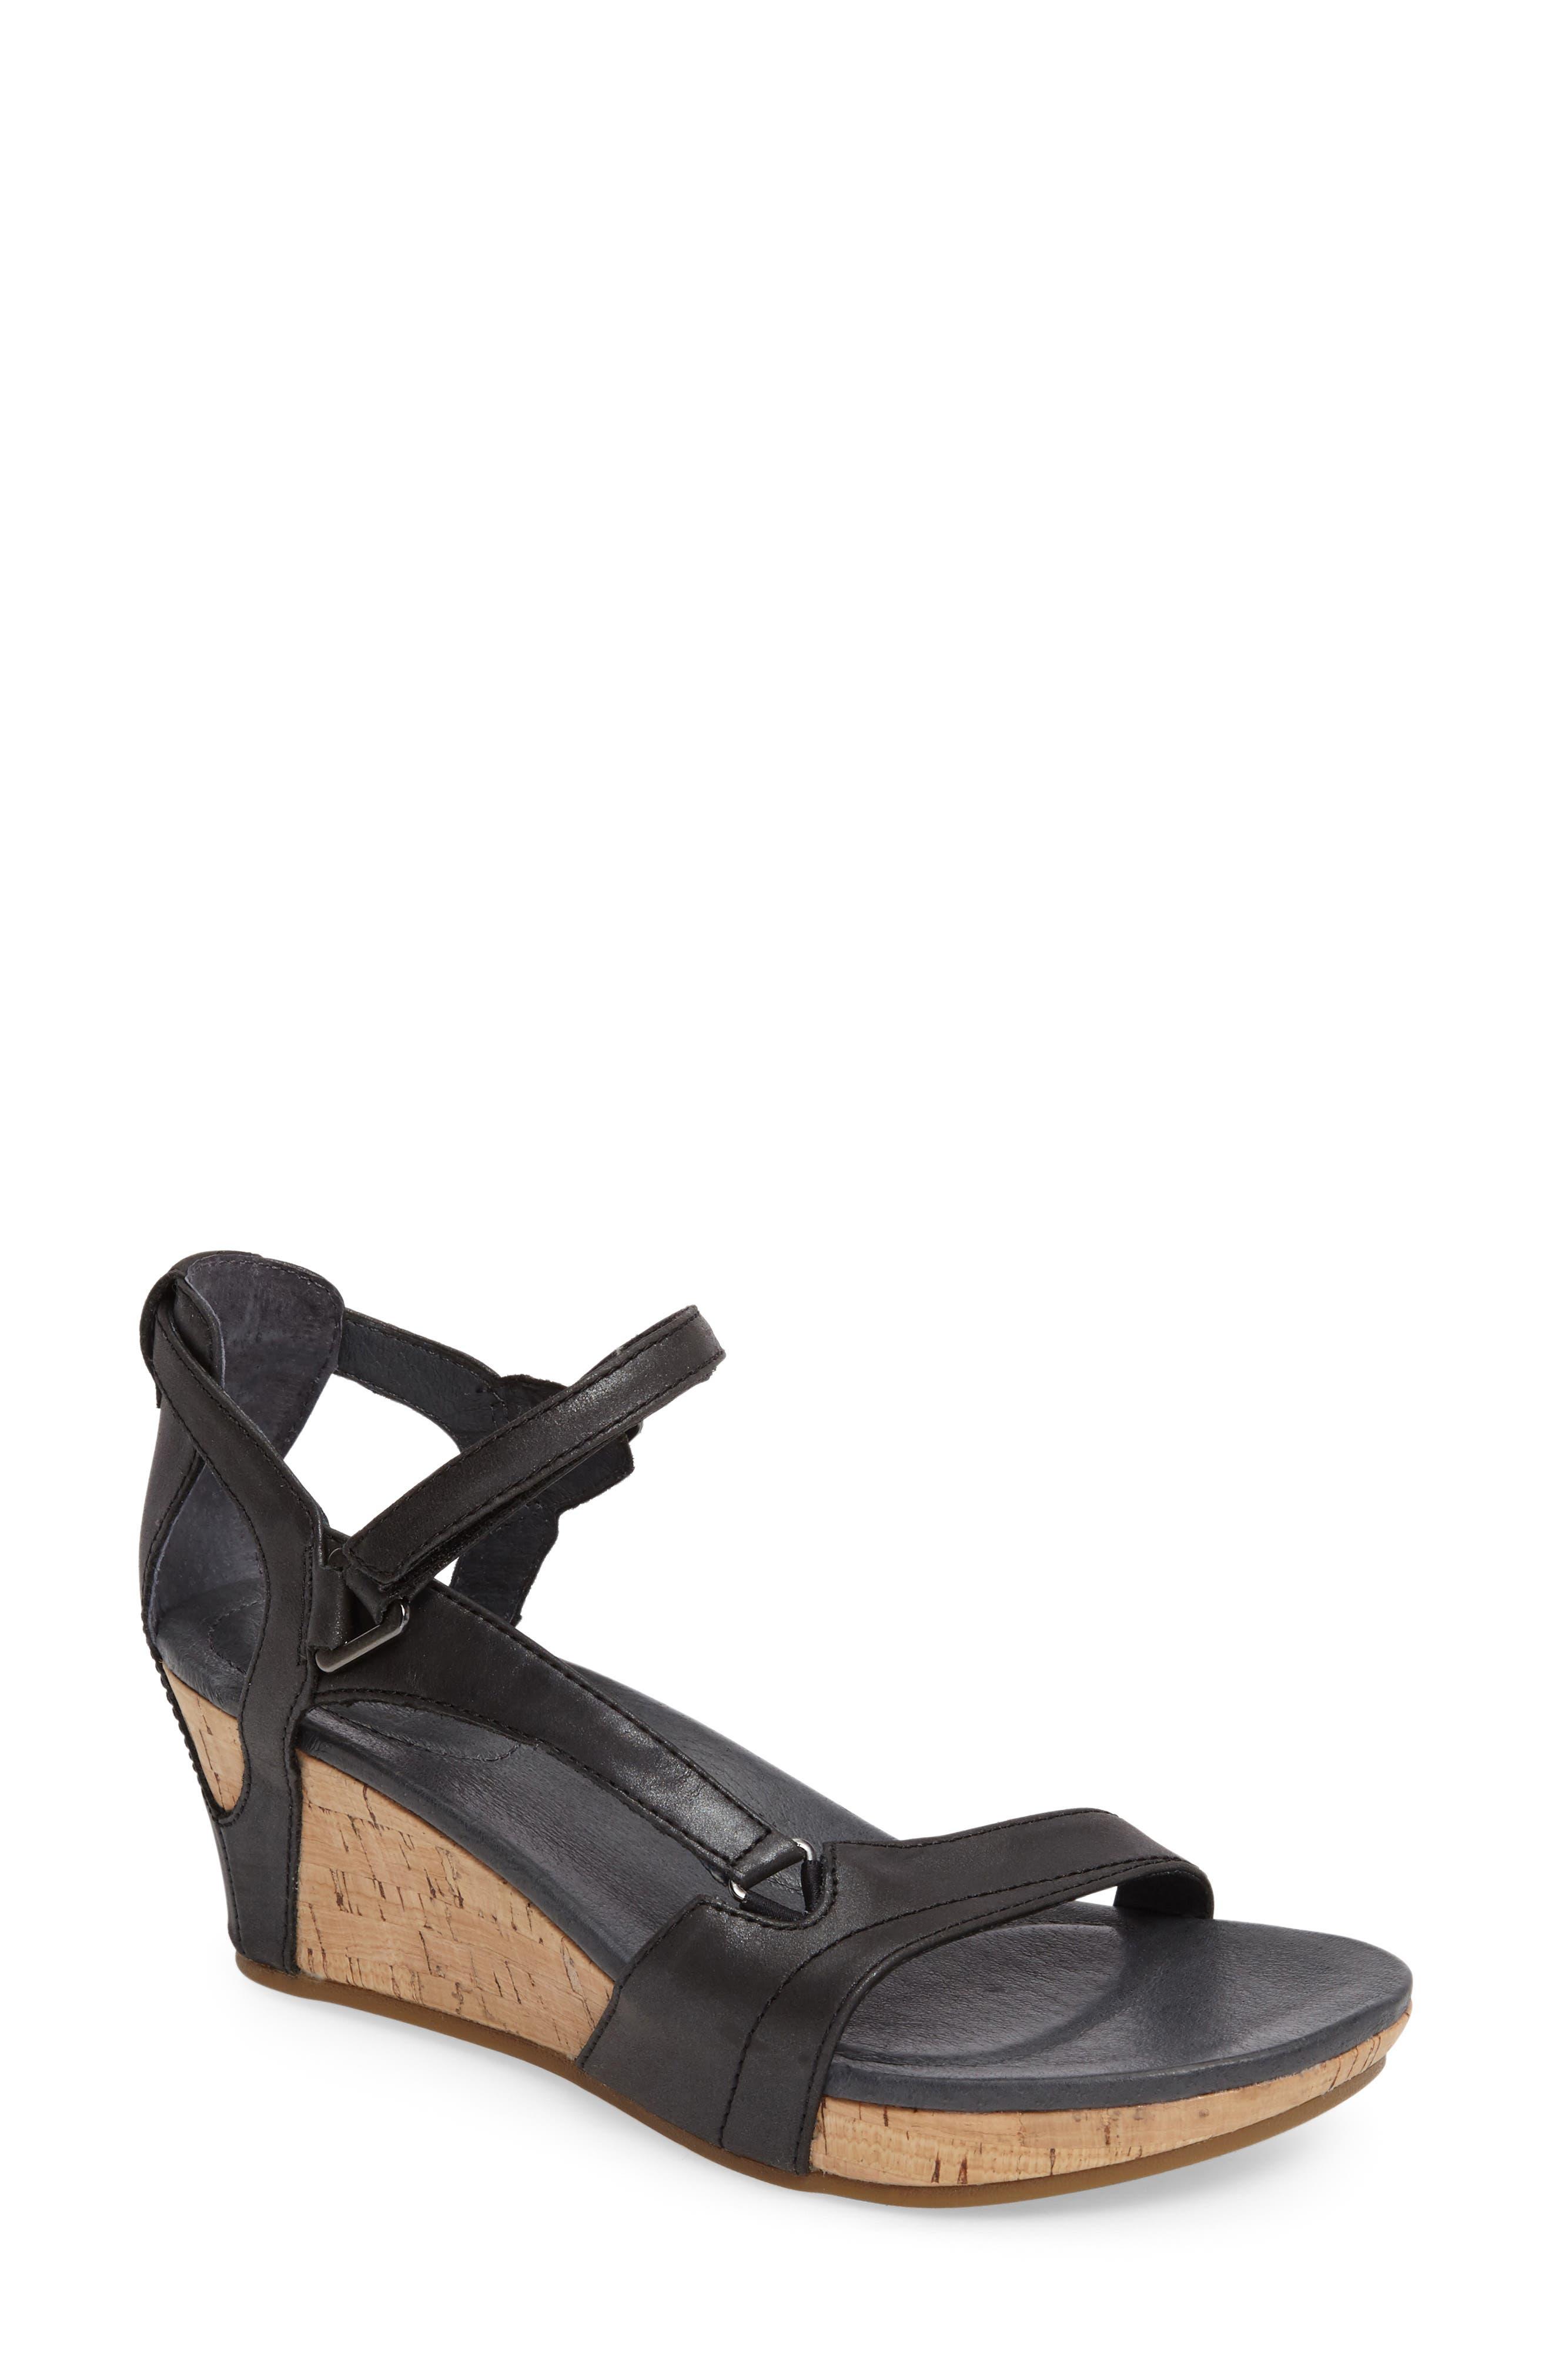 Savings Sandals Black Women's Wedge Teva Capri Wedge Canada Online Shop